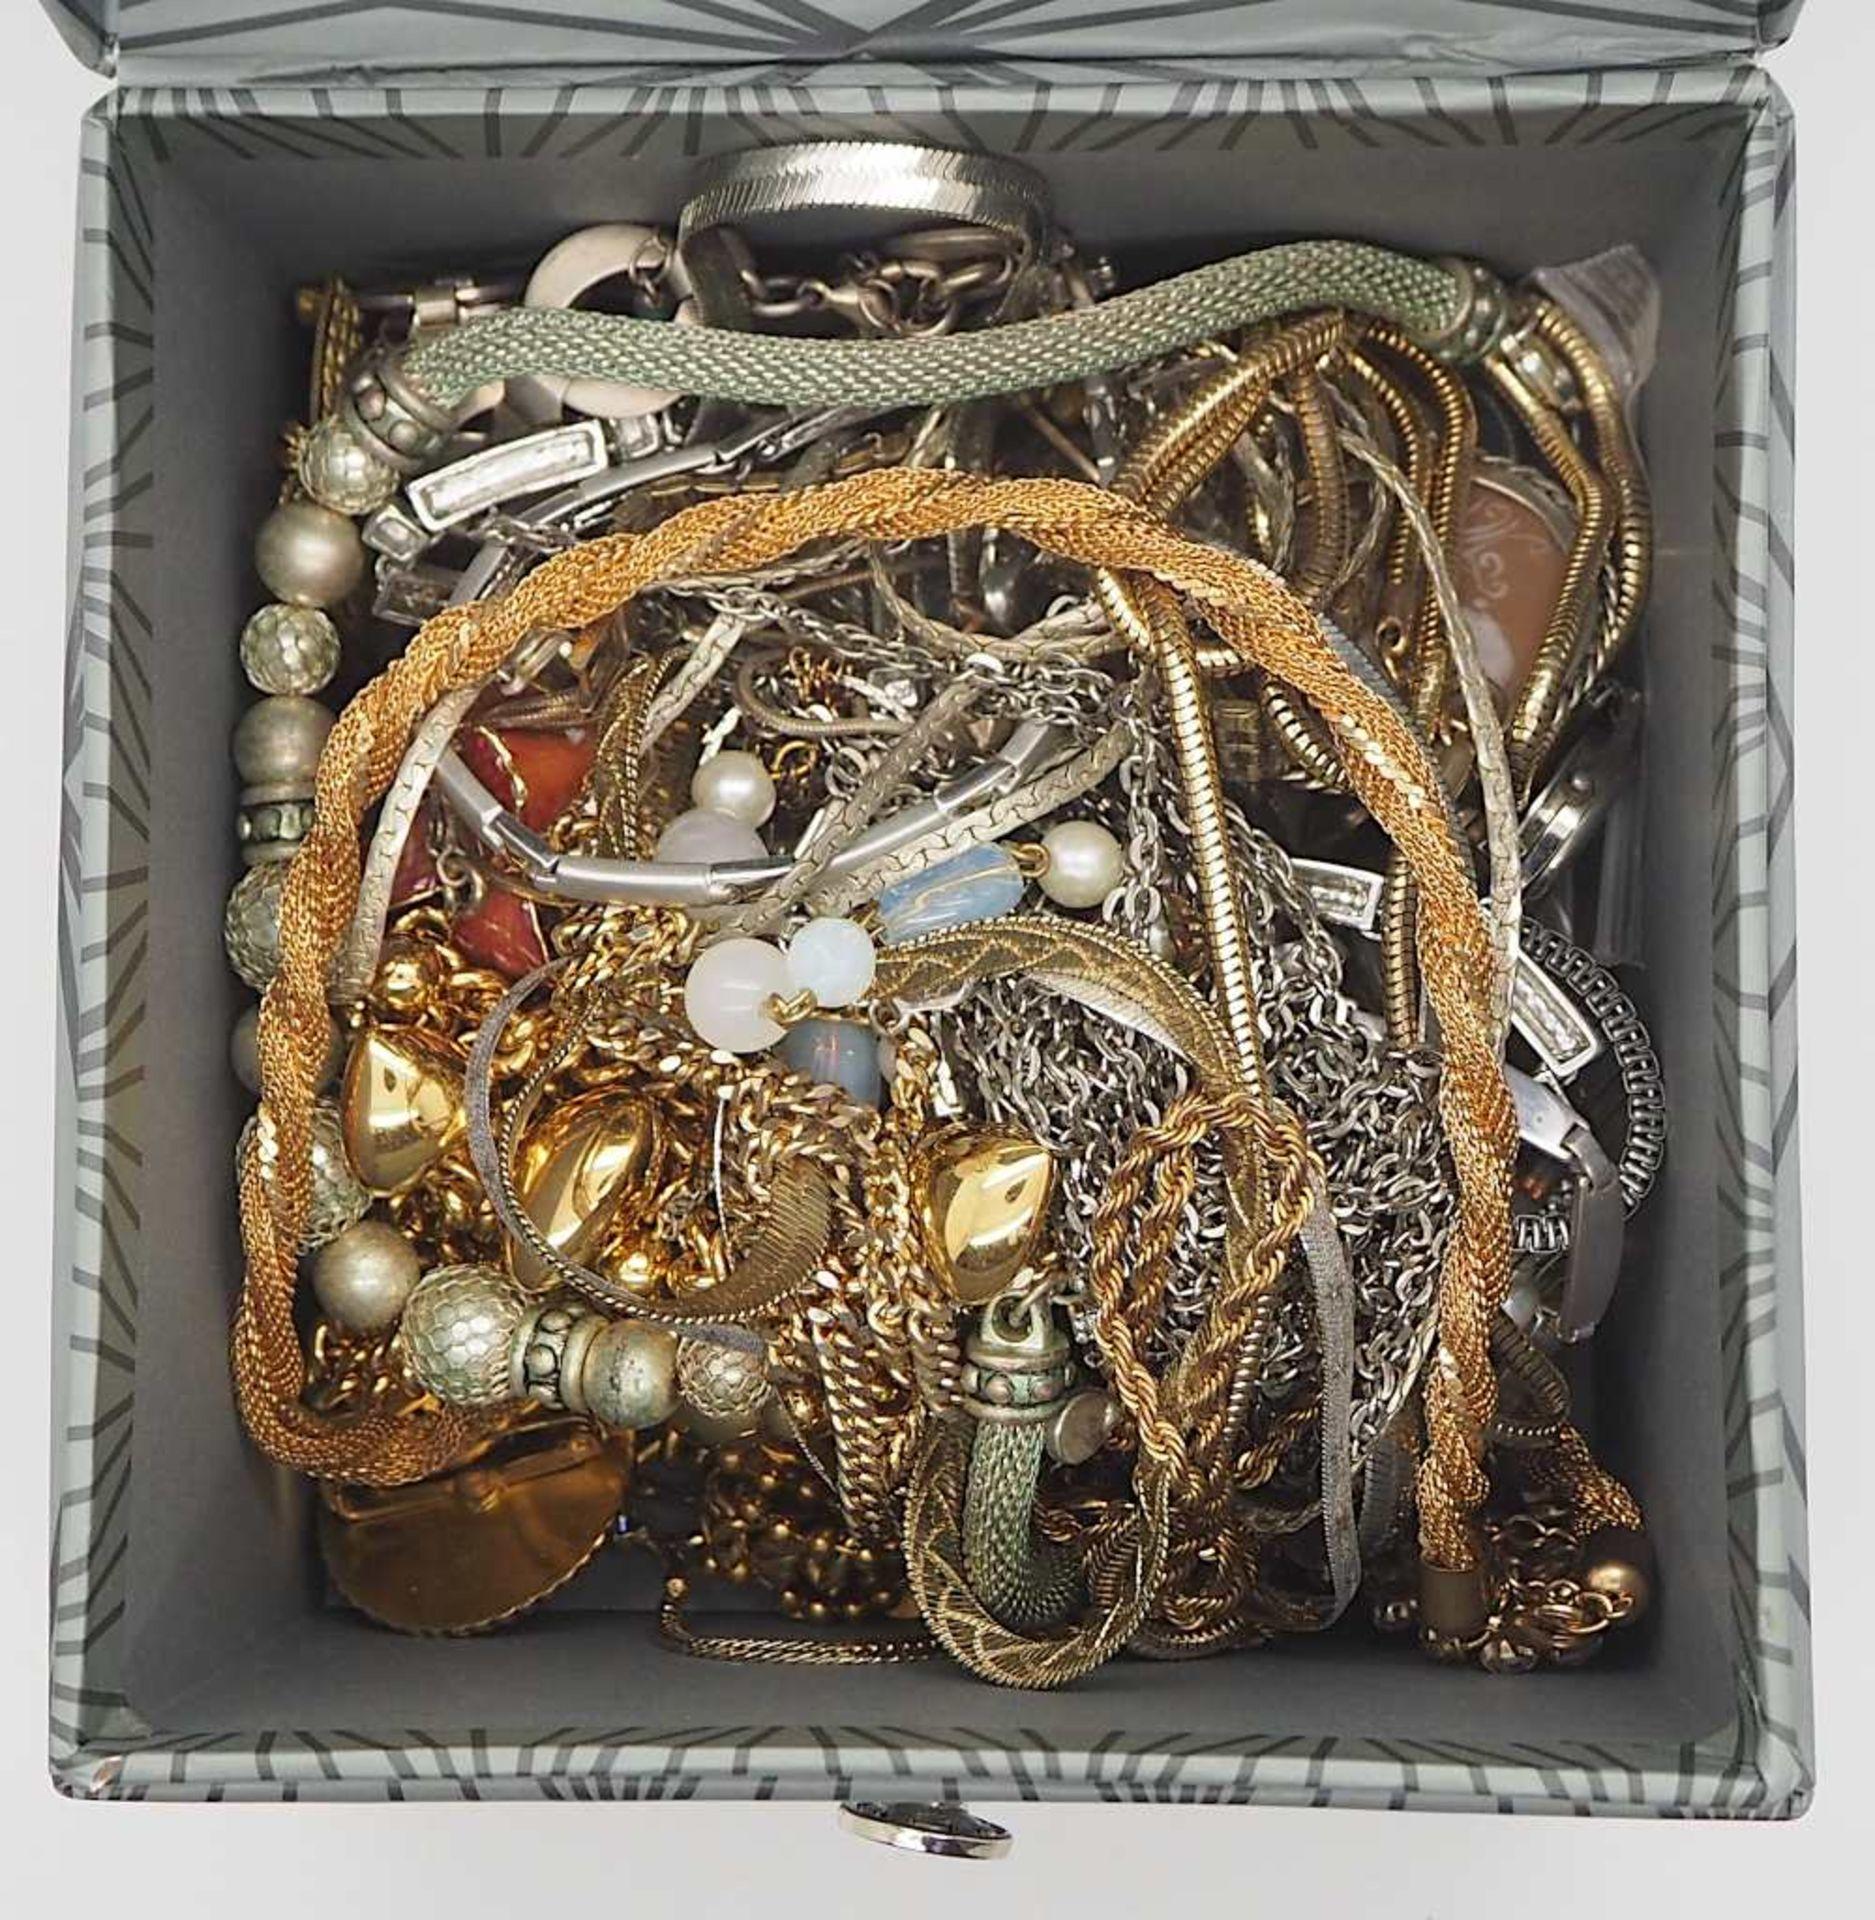 1 Konv. Schmuck/Armbanduhren u,.a., Mode u.a. in der Schatulle - Bild 3 aus 3